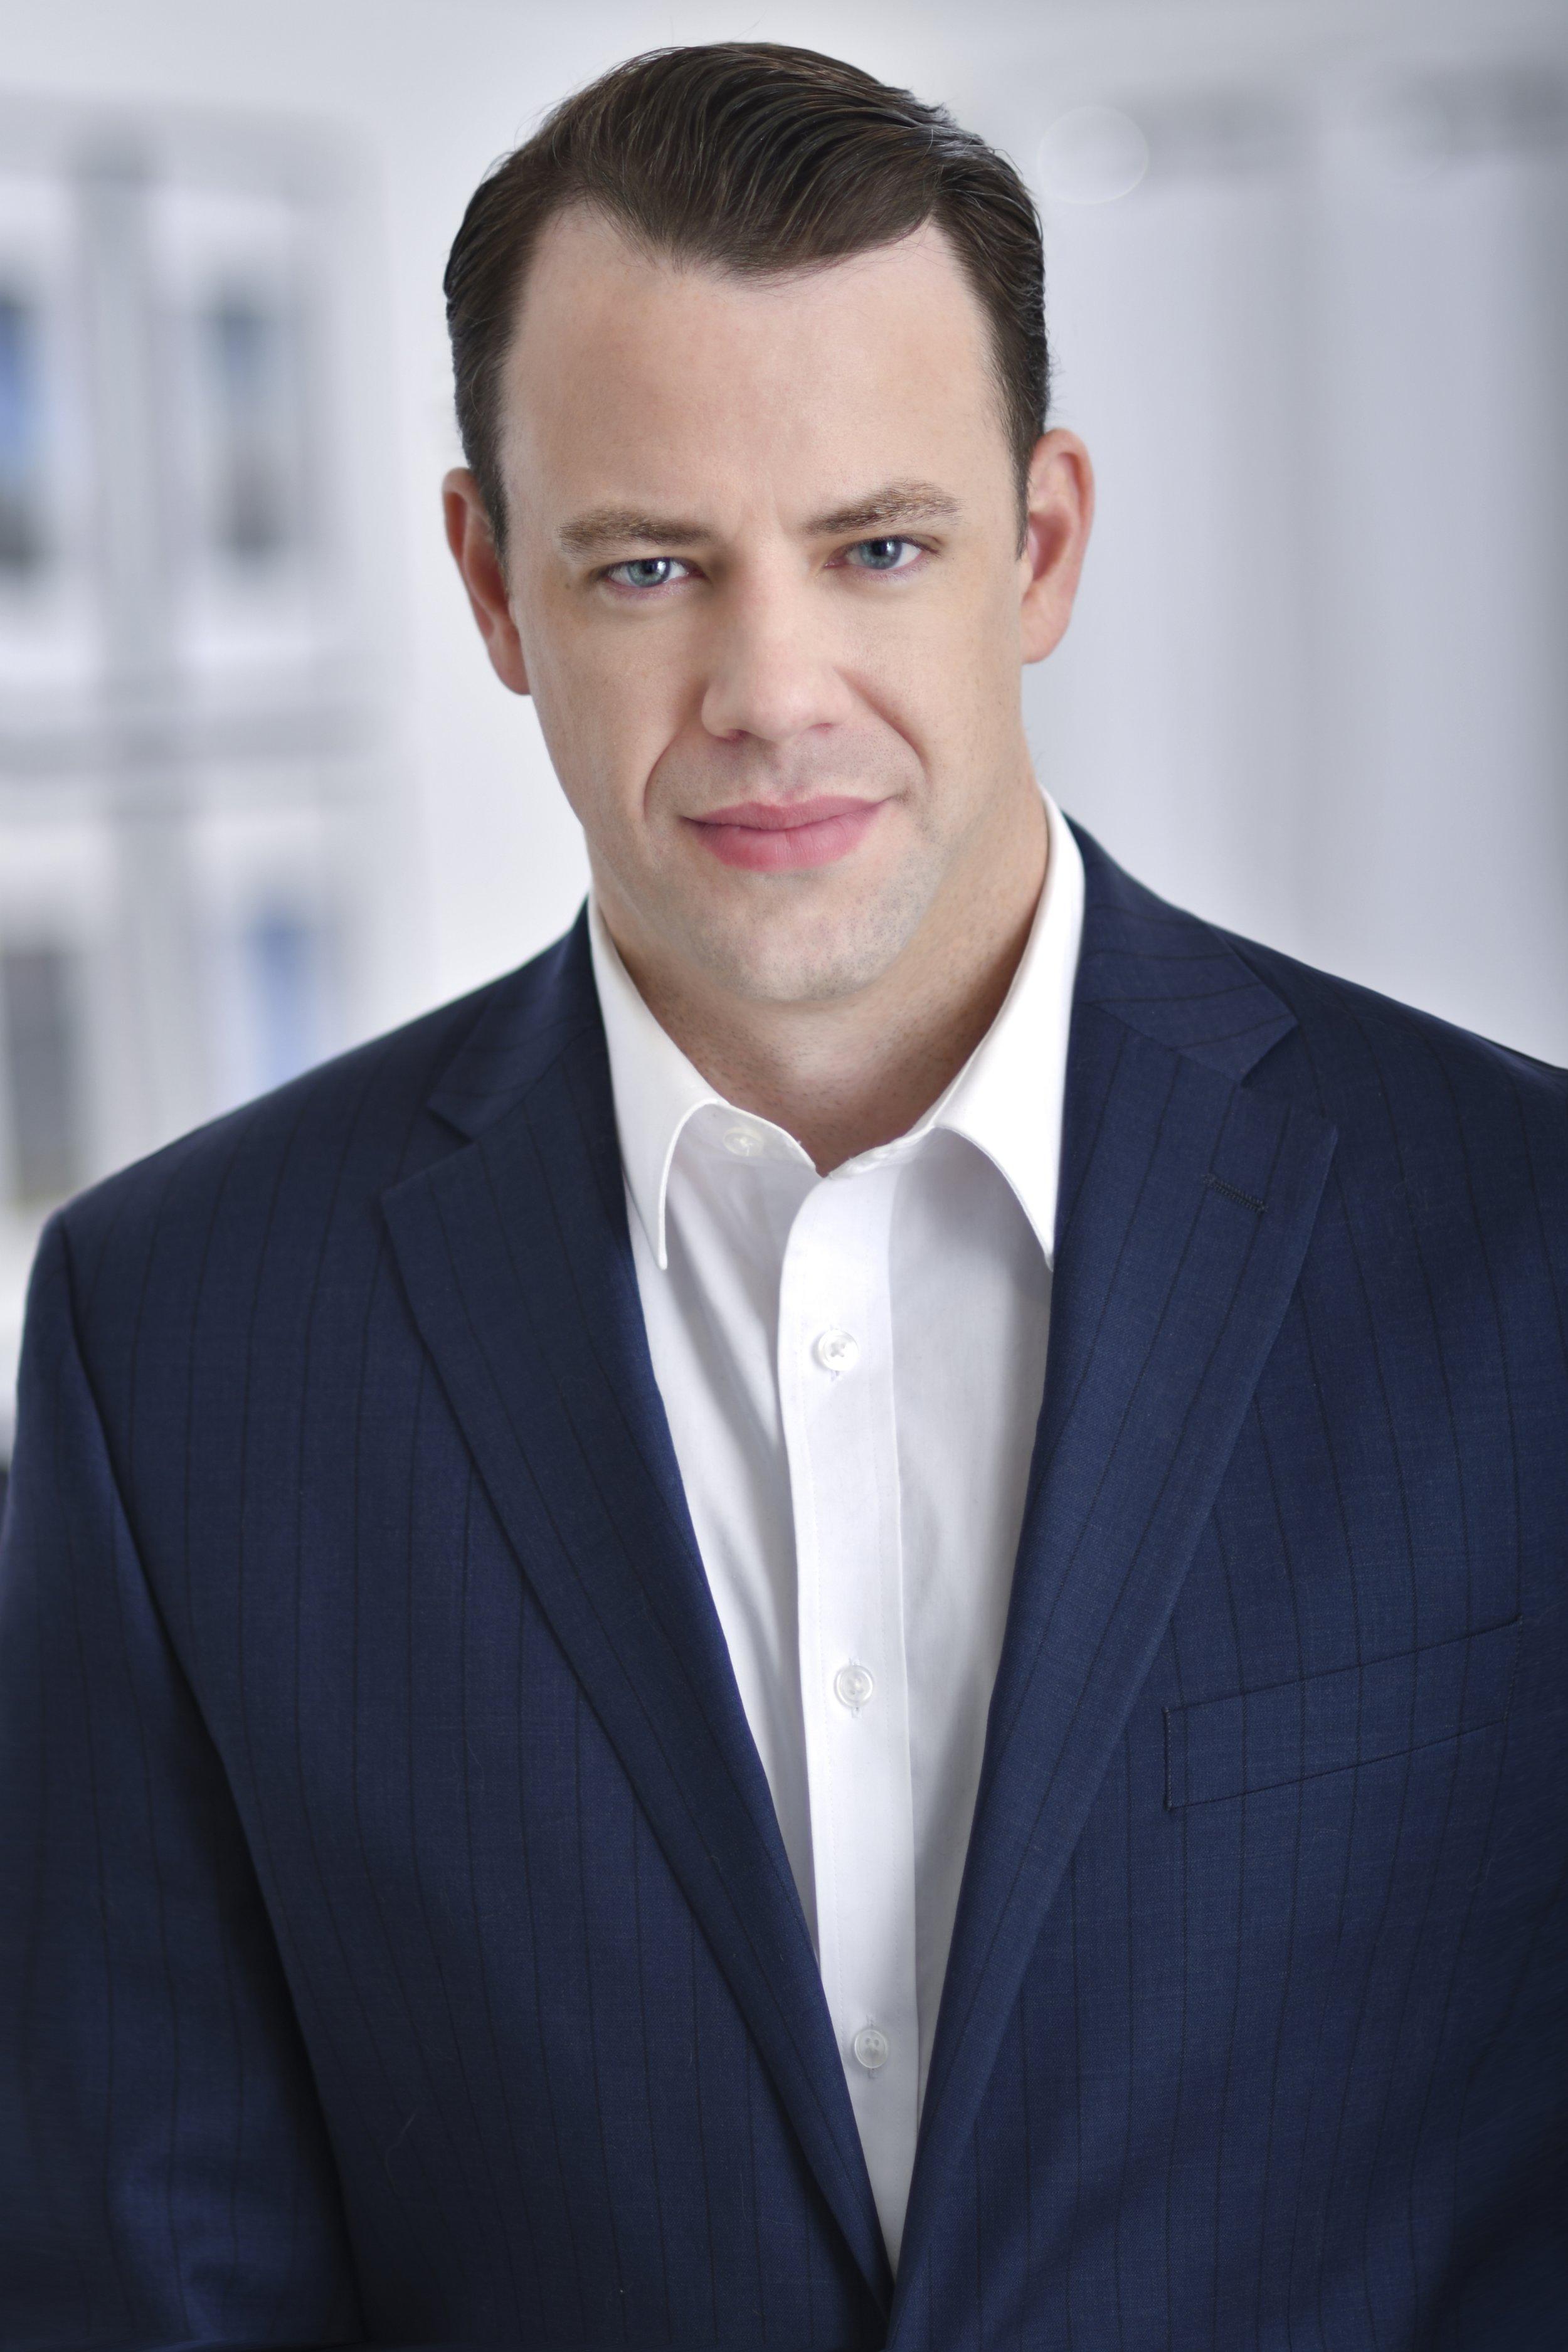 Matthew C. Tramm, Personal Family Lawyer